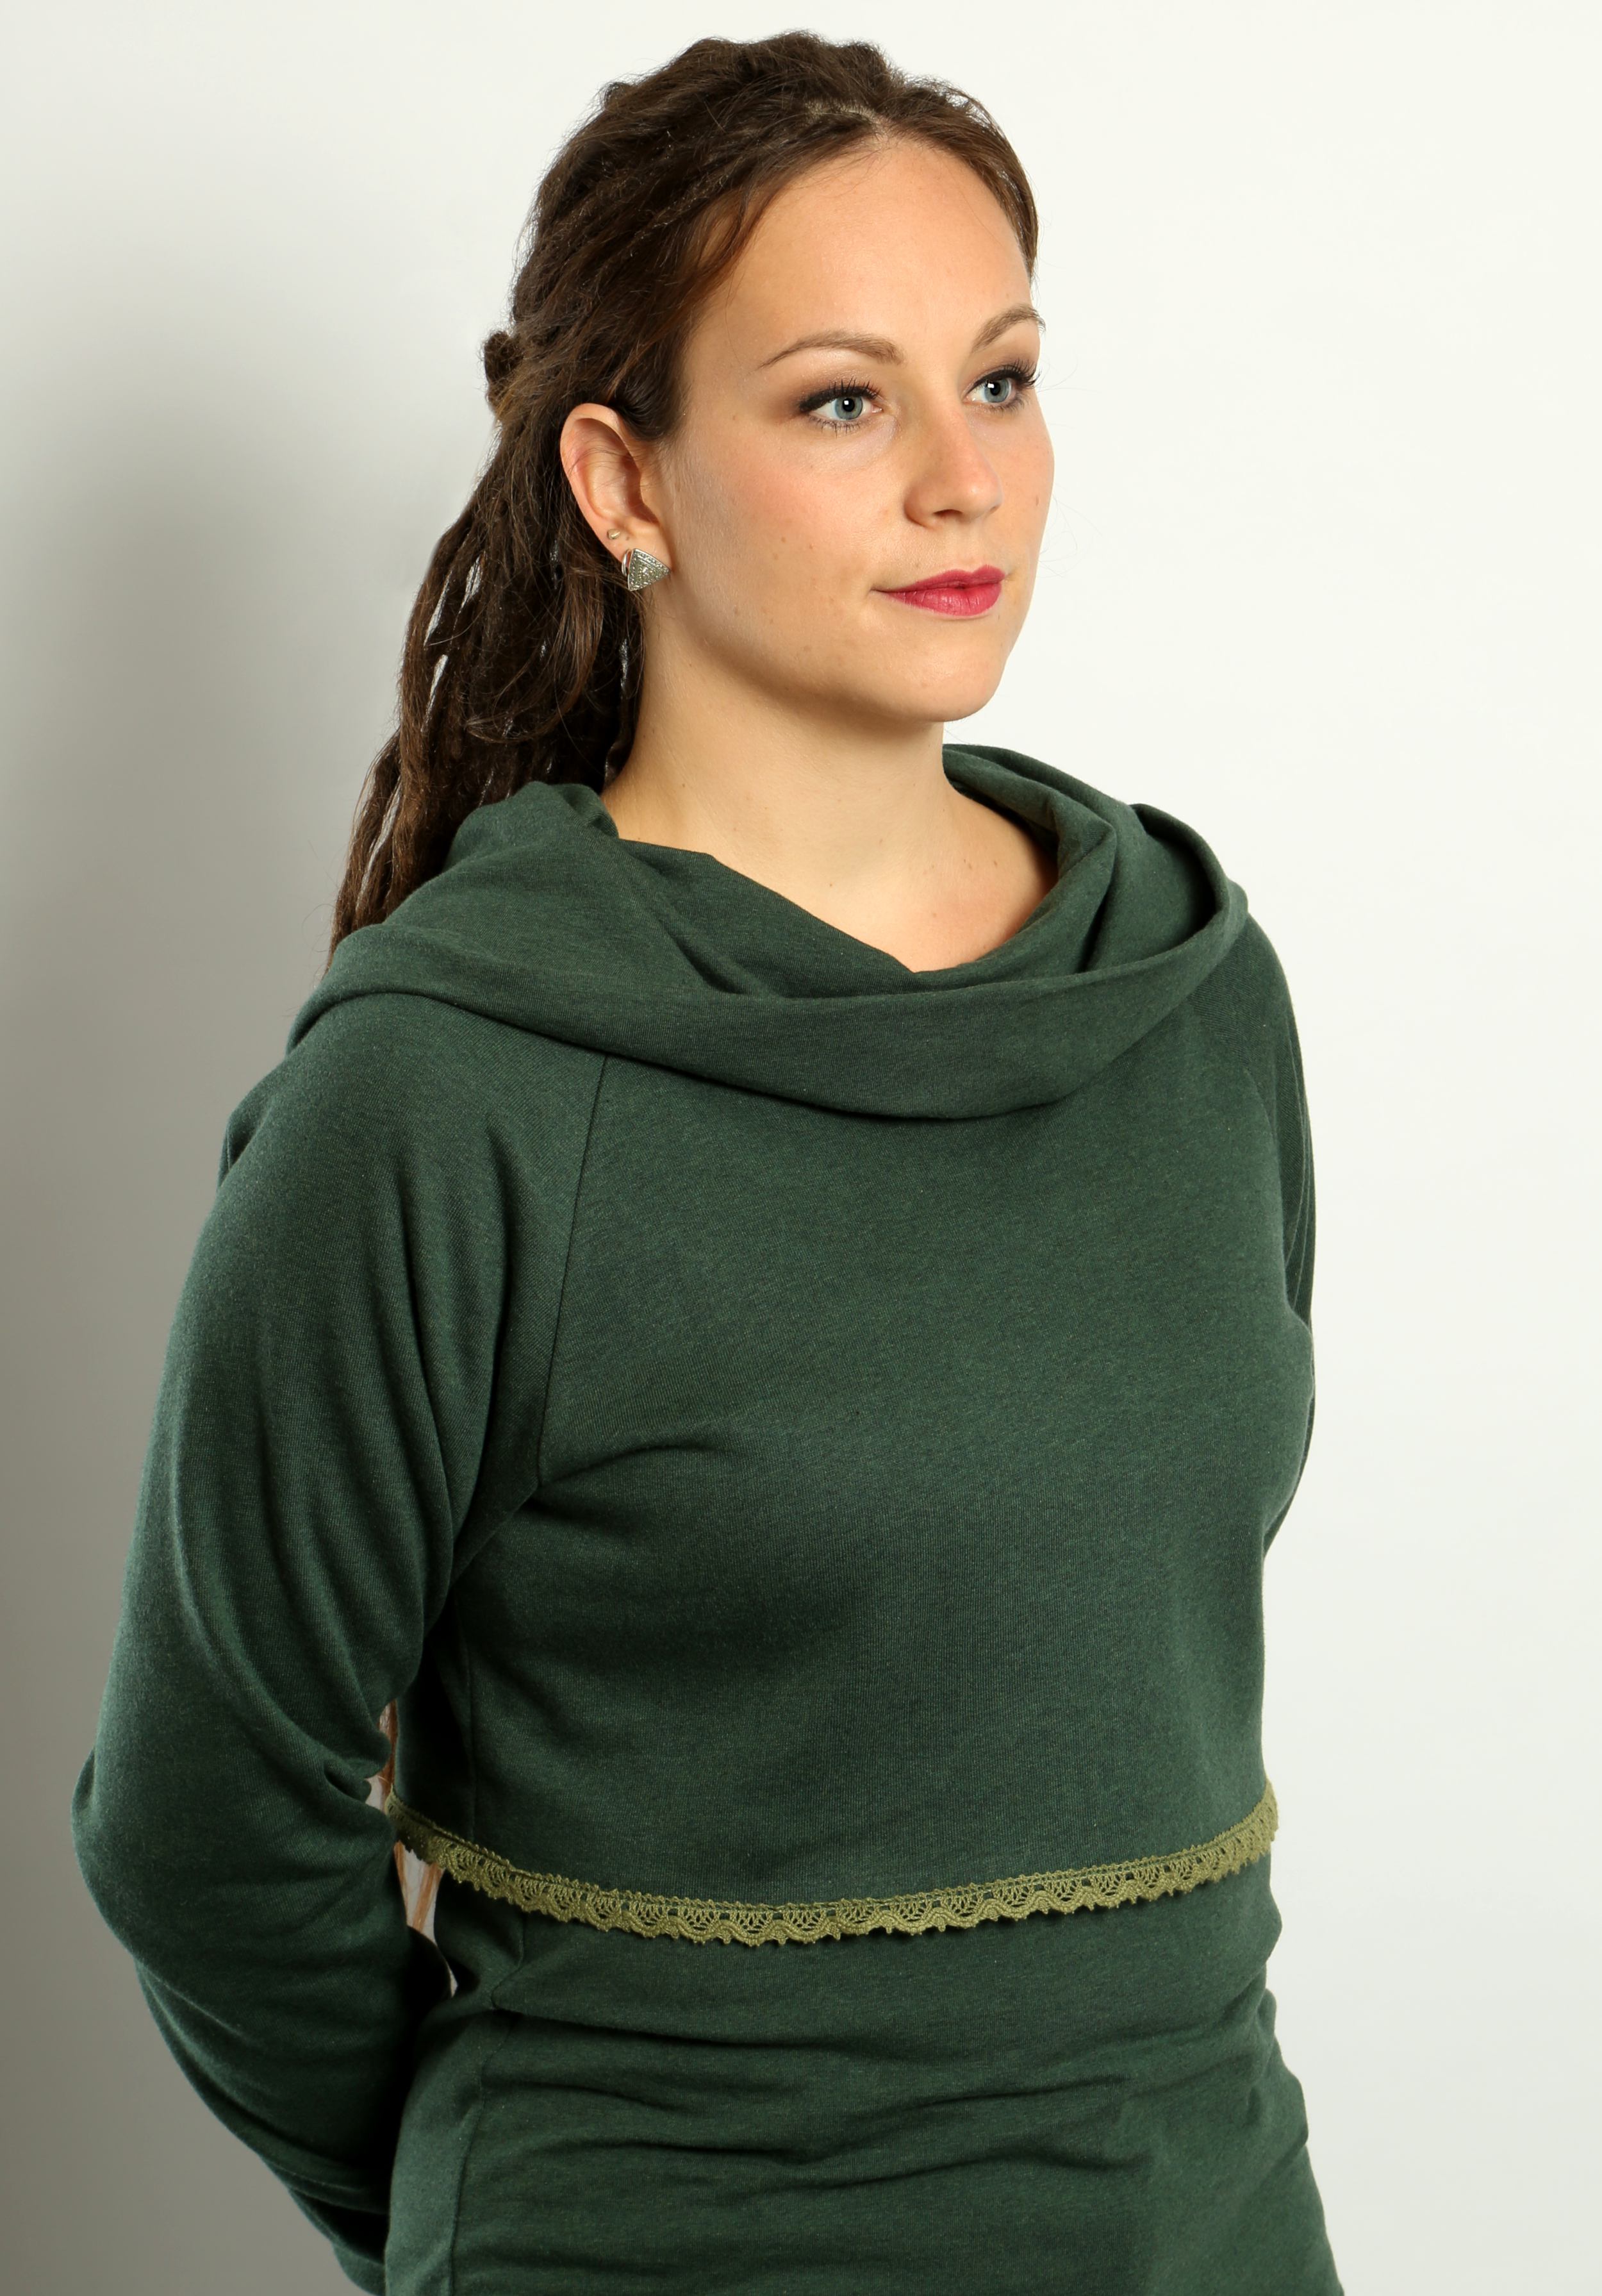 Kurzsweater Tanne